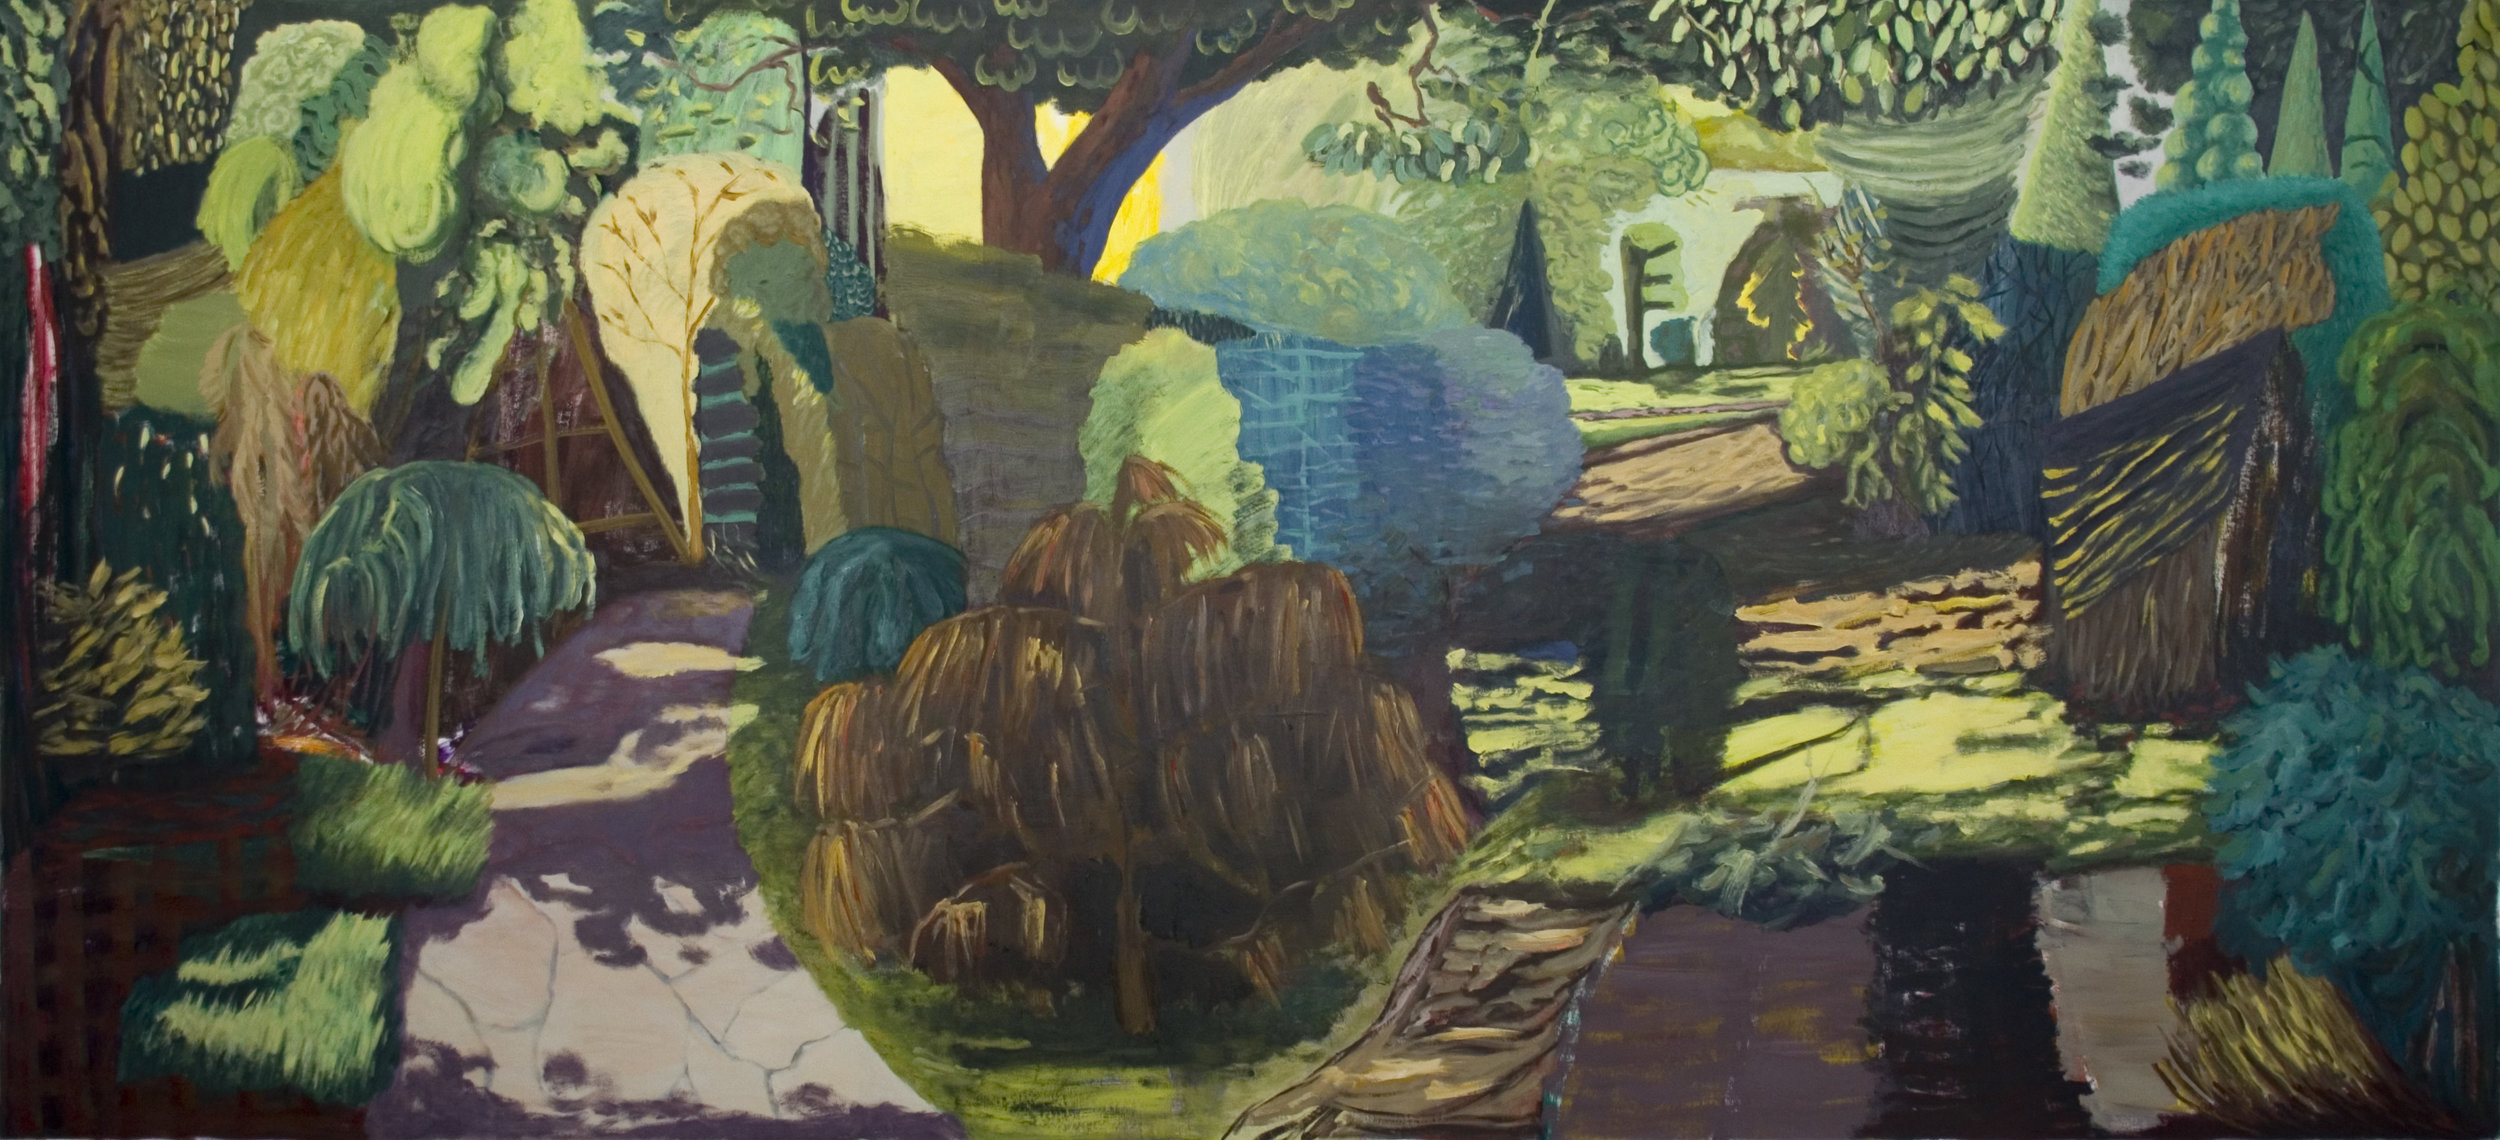 Garten, Öl auf Leinwand, 170 x 390 cm